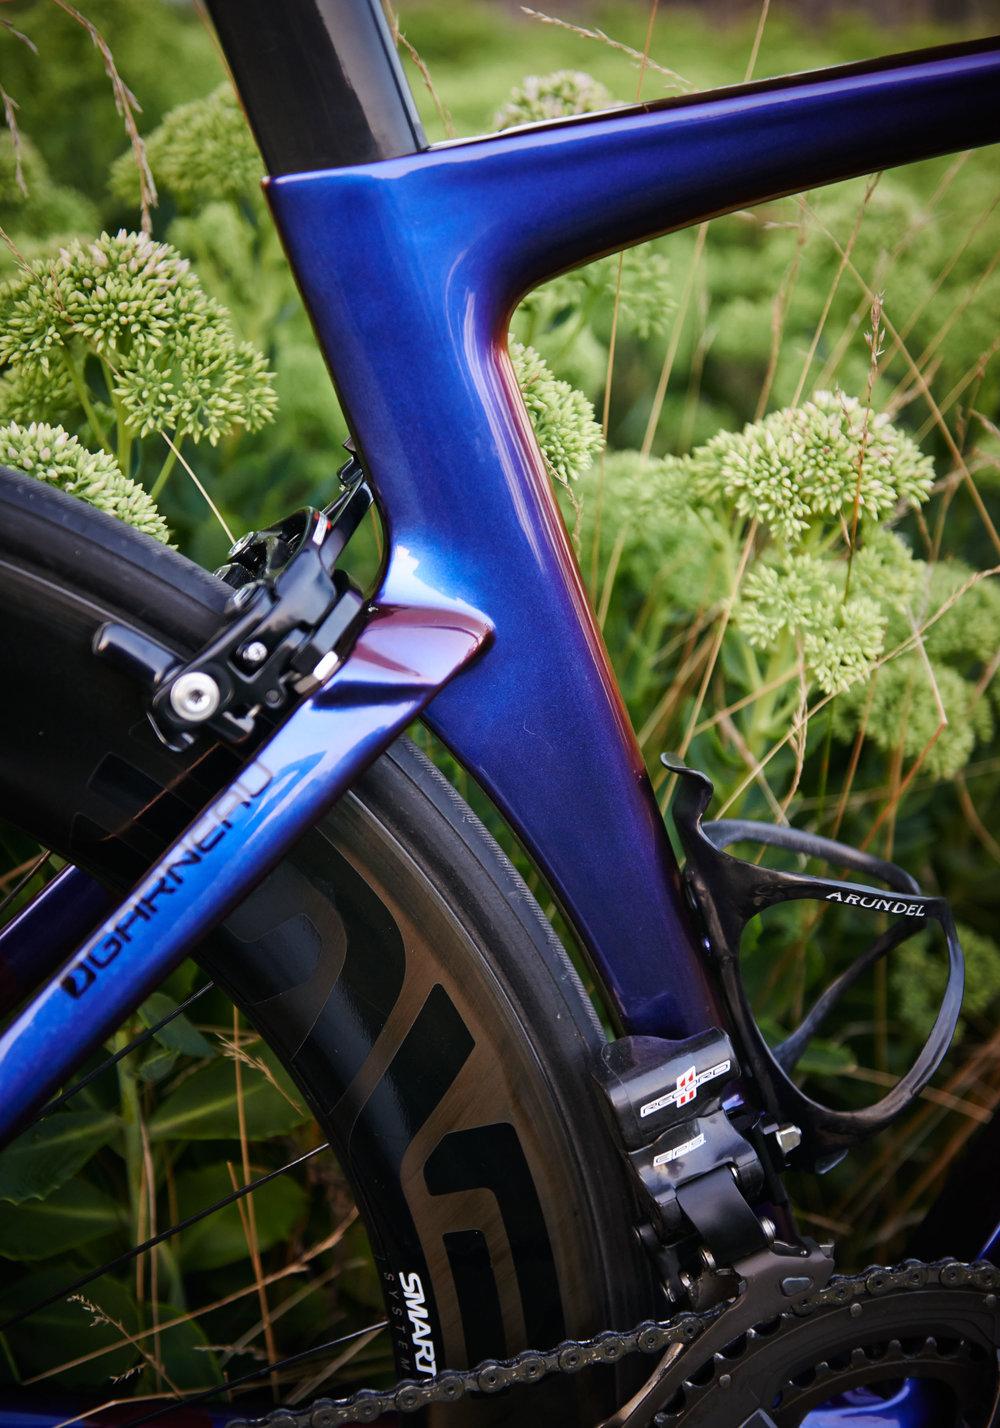 to-be-determined-garneau-a1-bike-review-117.jpg